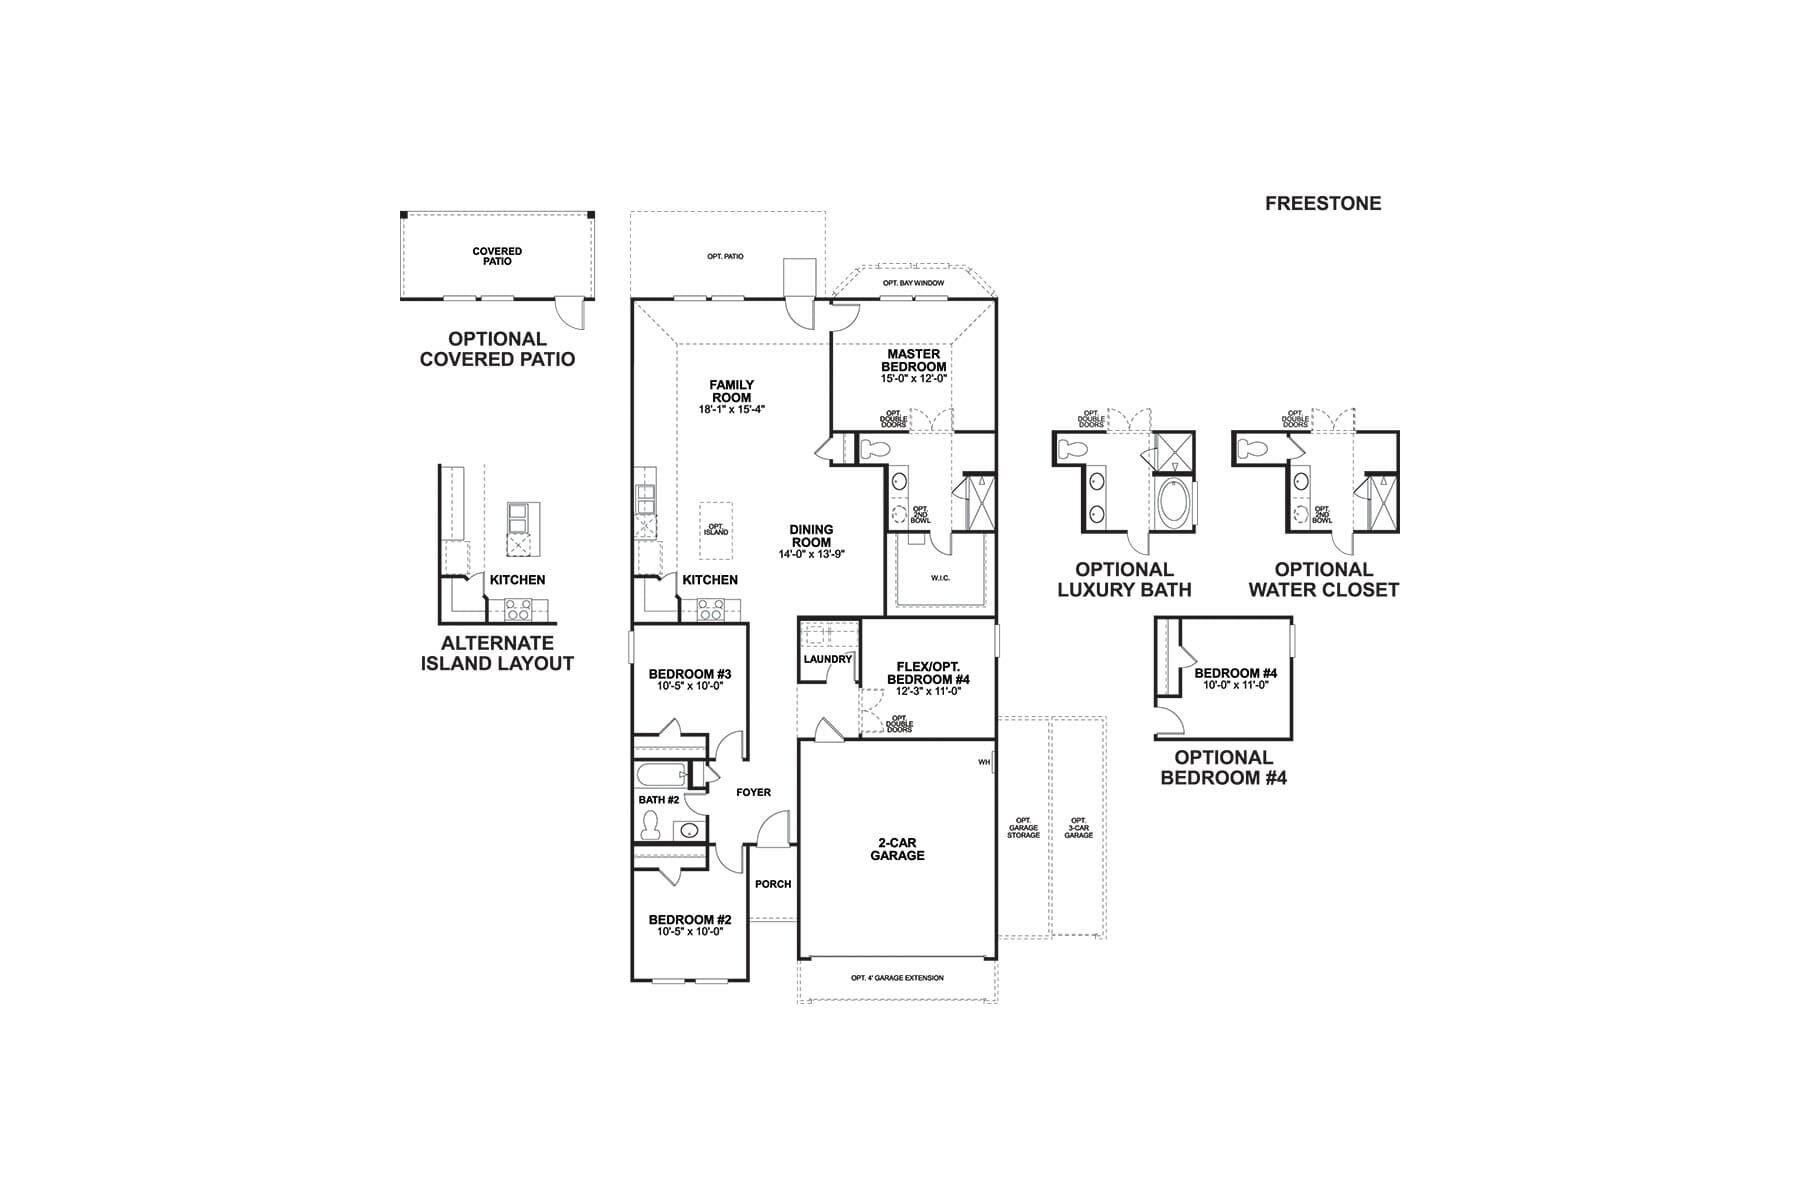 Freestone First Floor